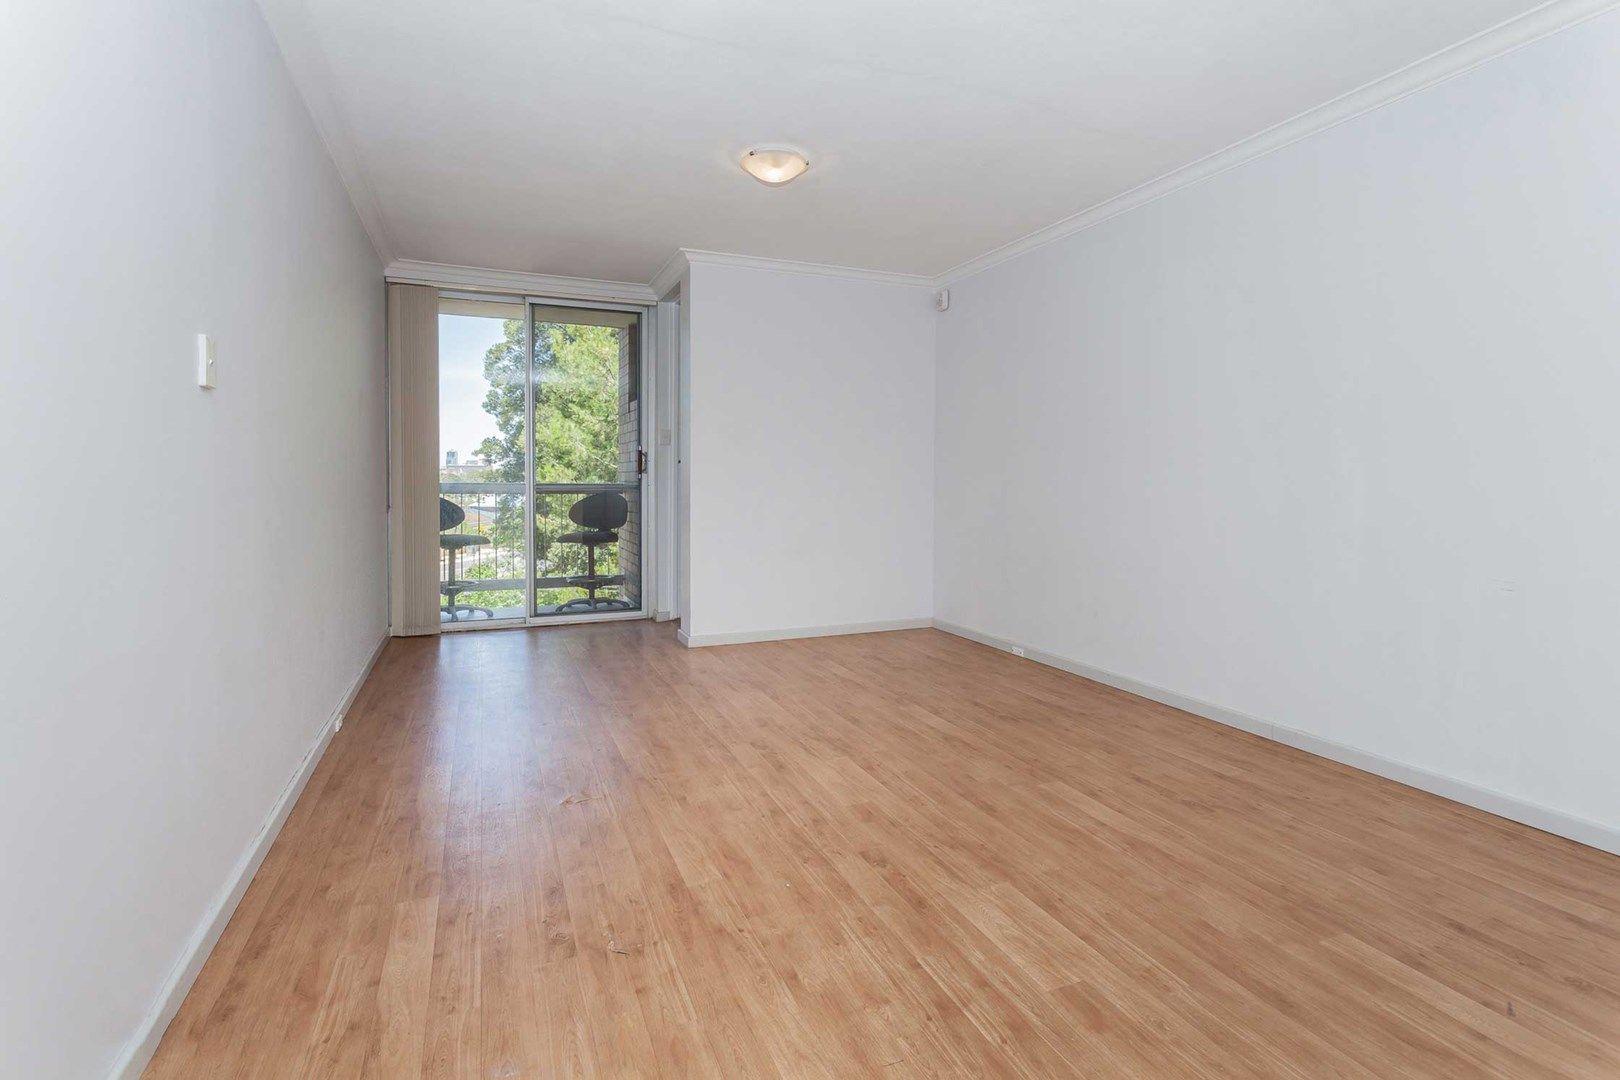 26/537 William Street, Mount Lawley WA 6050, Image 1